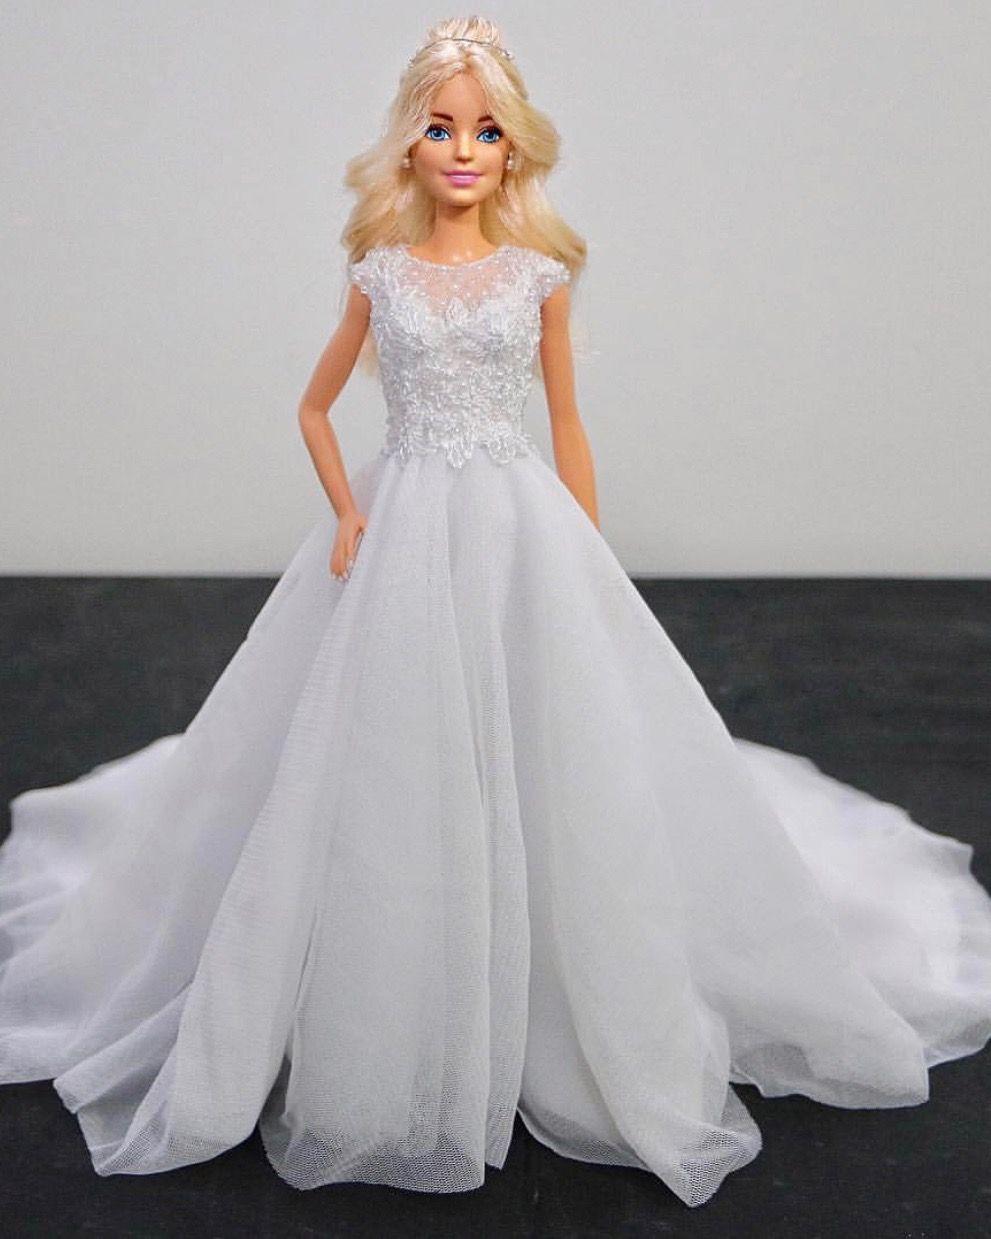 20..20/ sammurakammi   Barbie wedding dress, Barbie bridal, Barbie bride